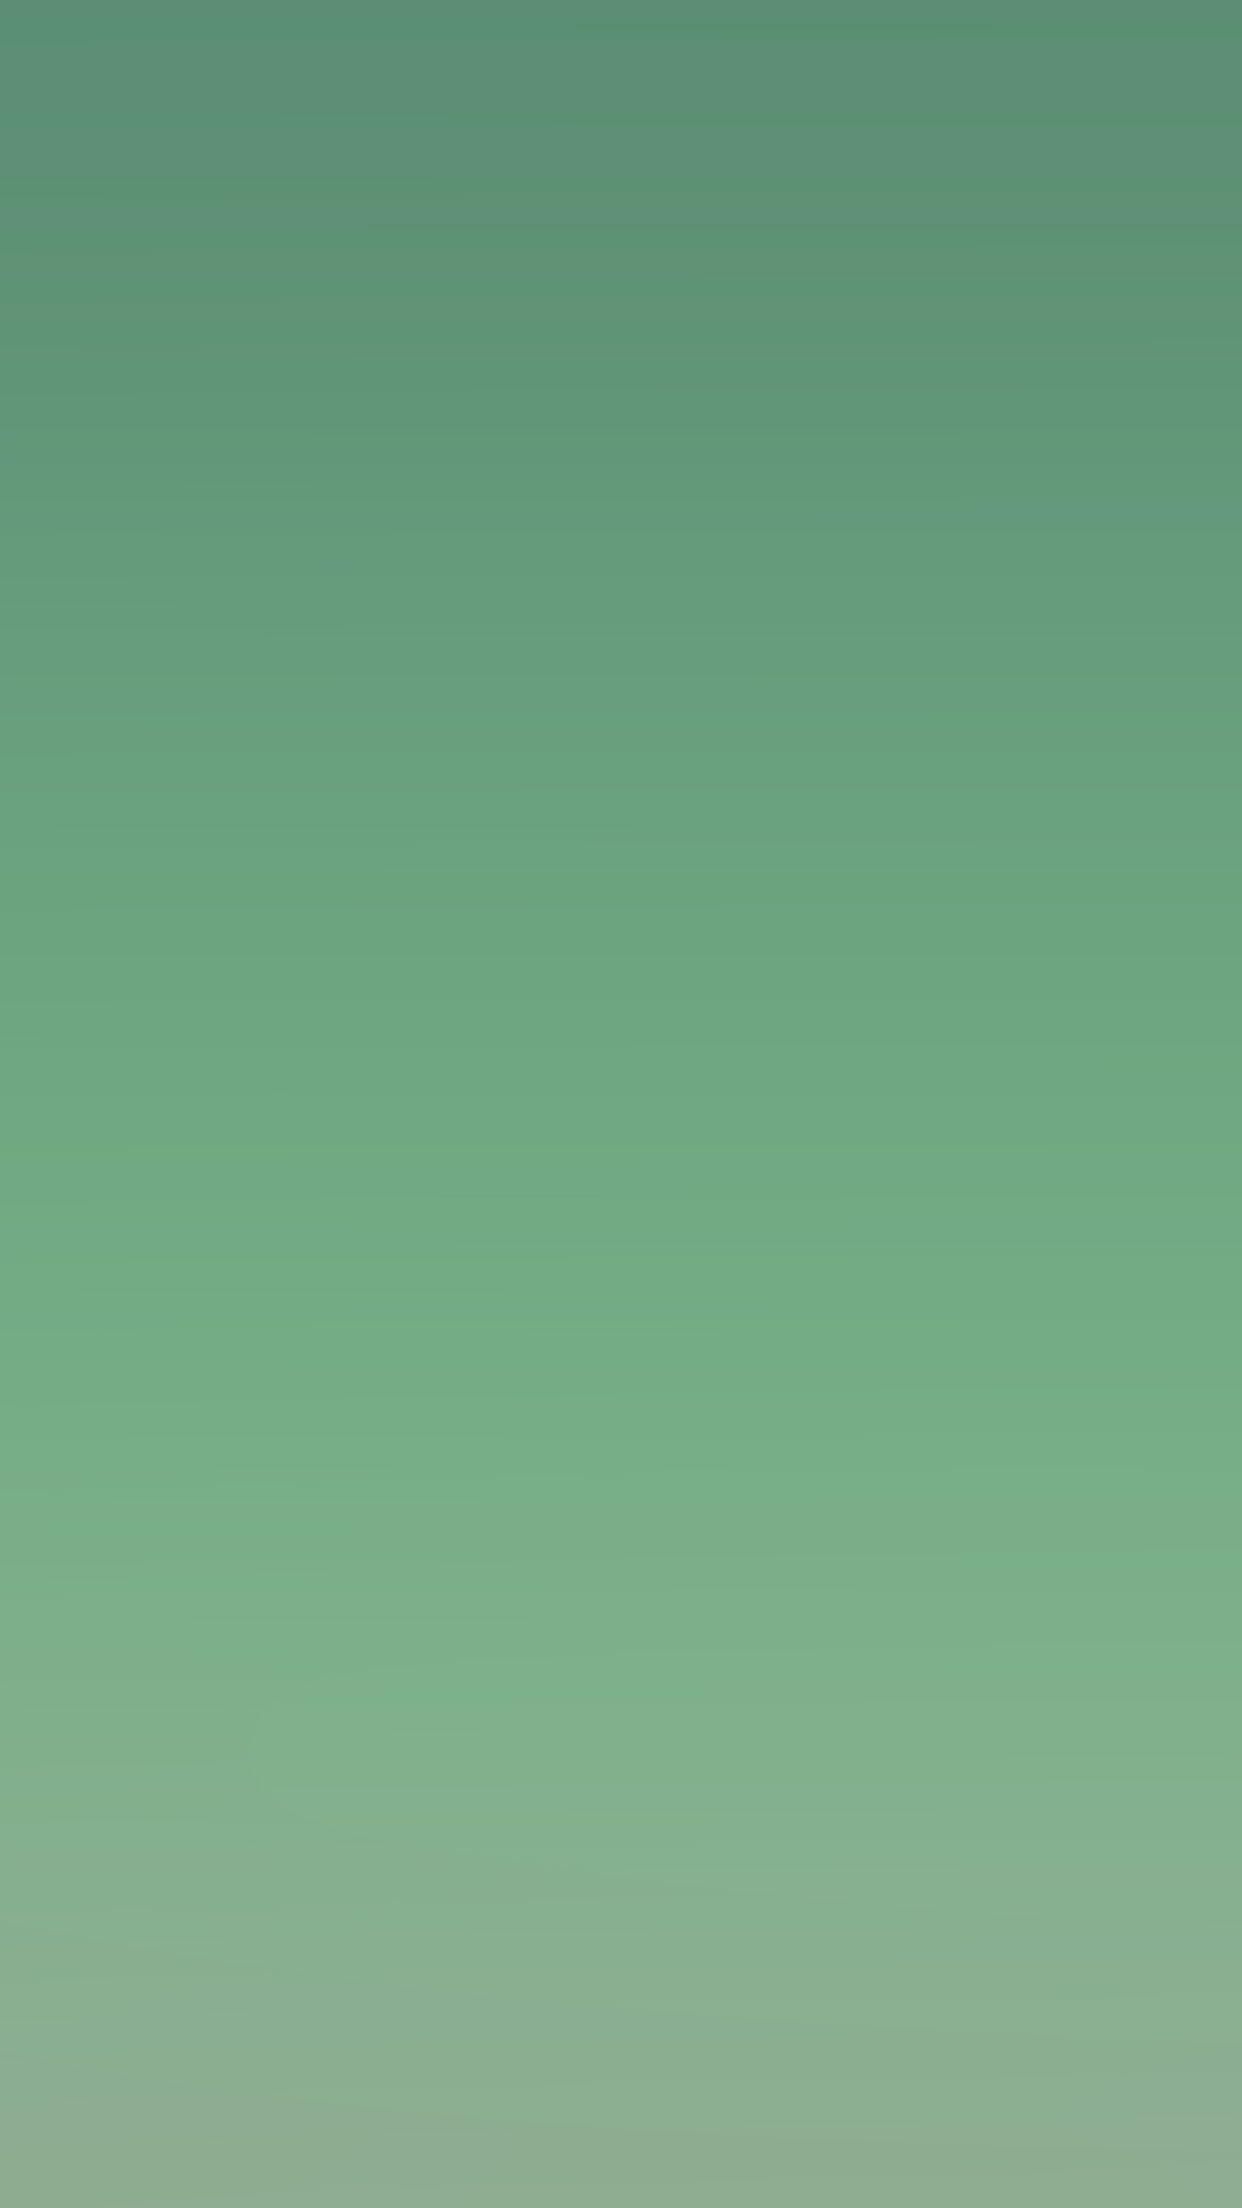 Pastel Green iPhone Wallpapers - Top ...